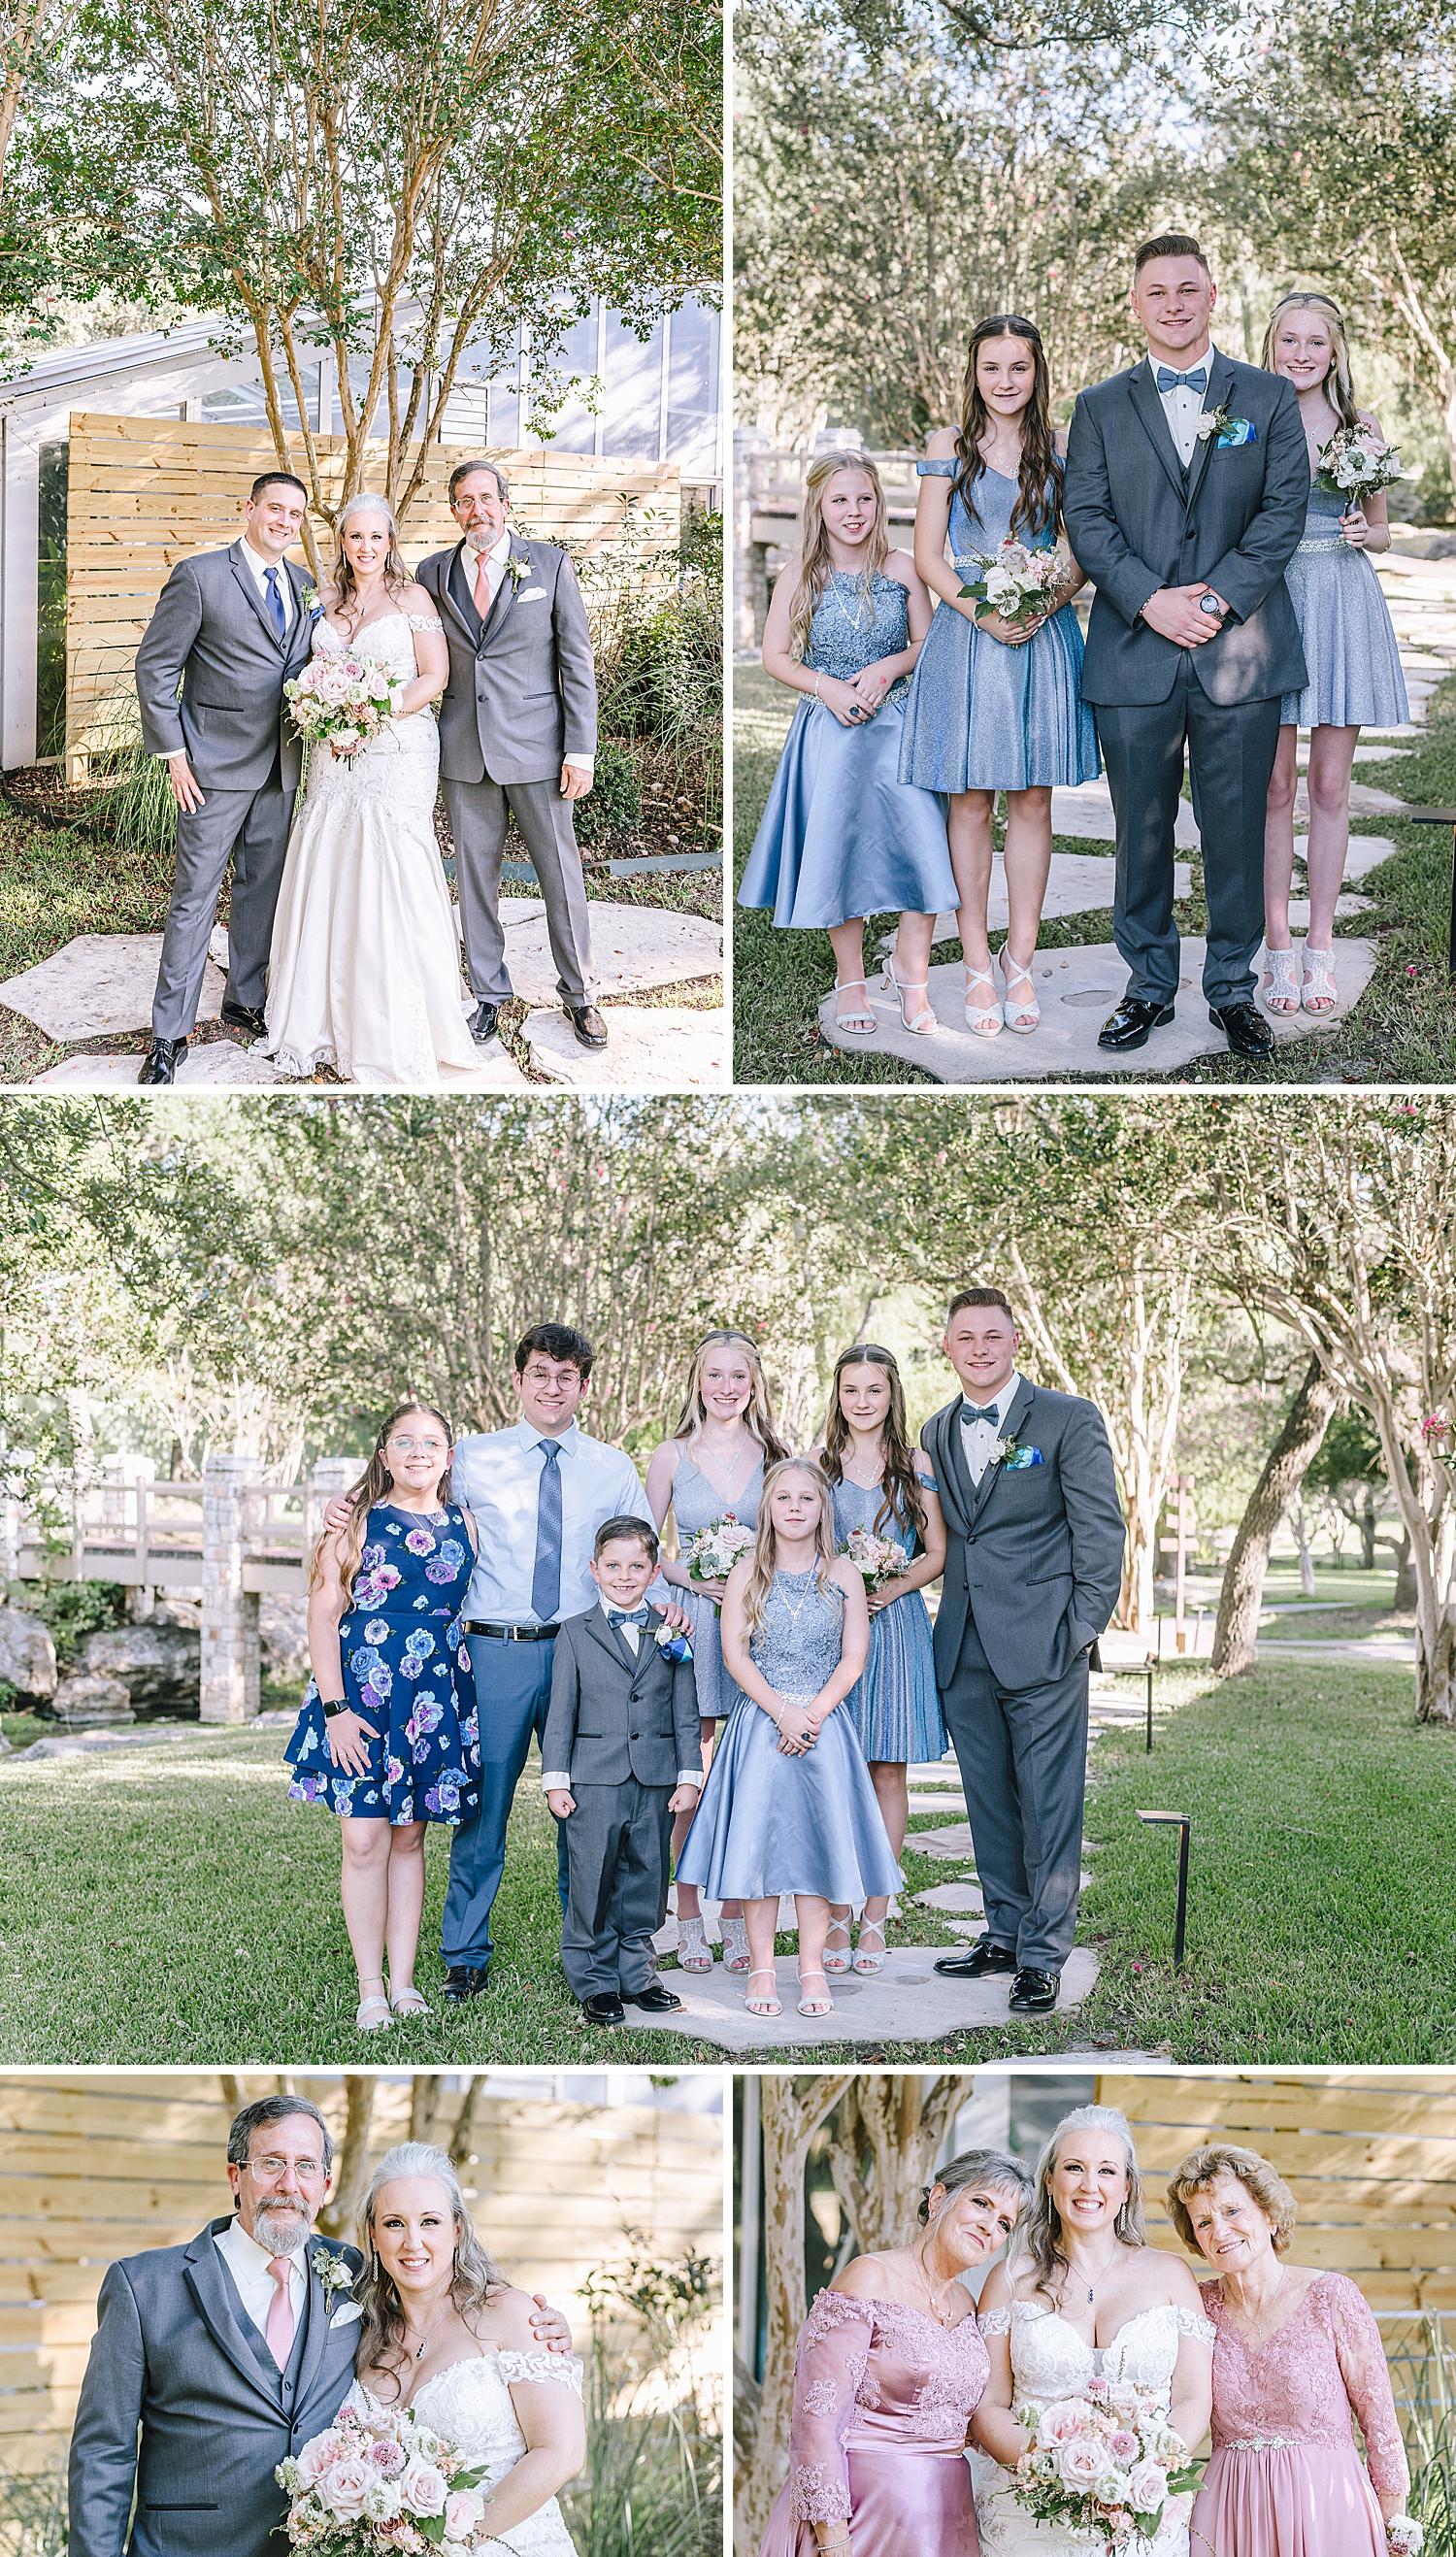 The-Club-at-Garden-Ridge-Military-Wedding-Carly-Barton-Photography_0079.jpg